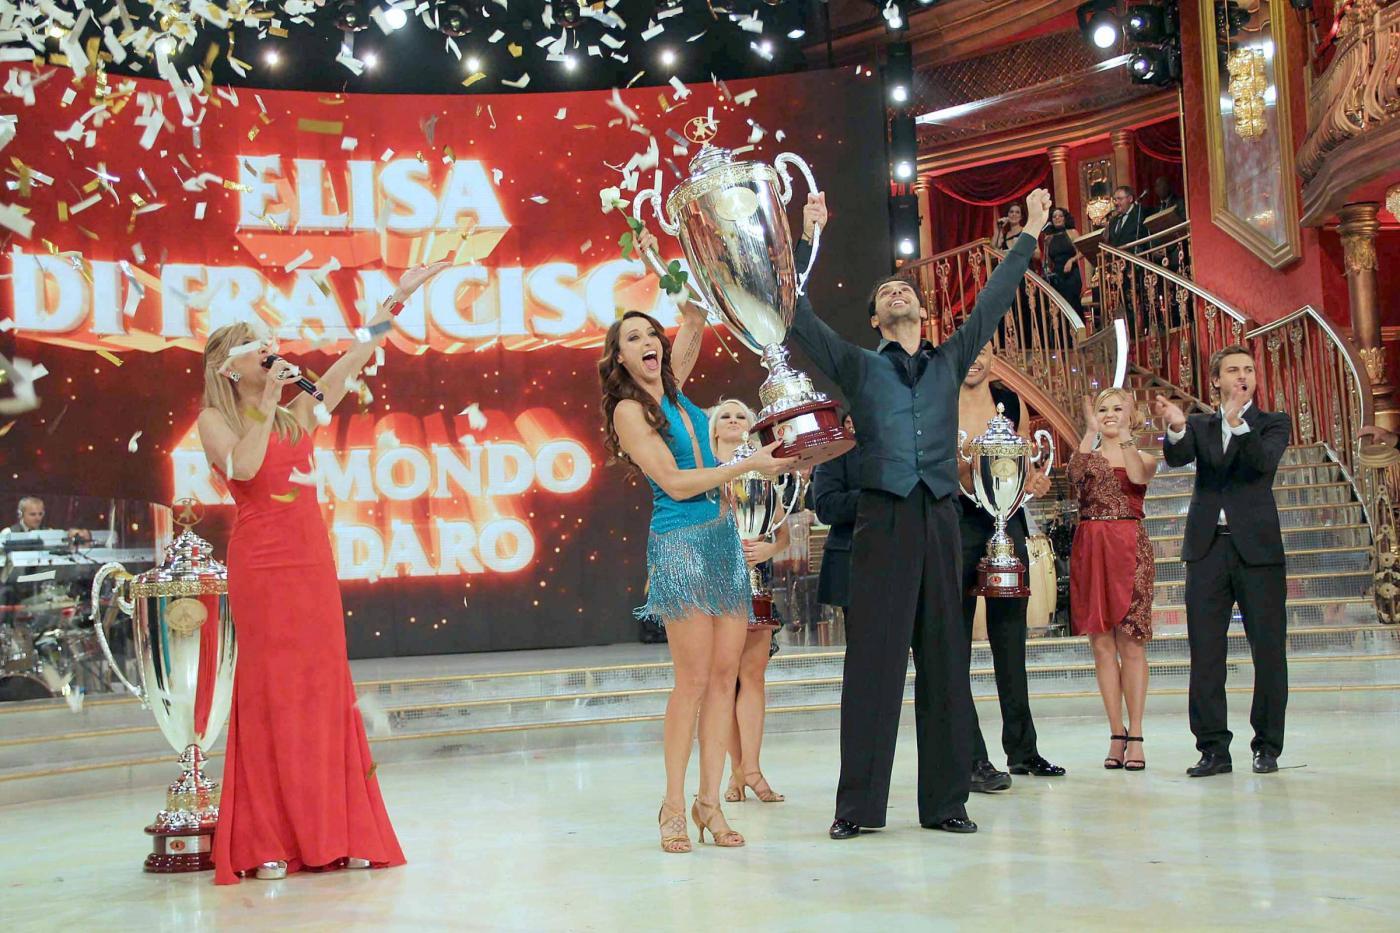 Ballando Con le stelle 2013 vince Elisa De Francisca01